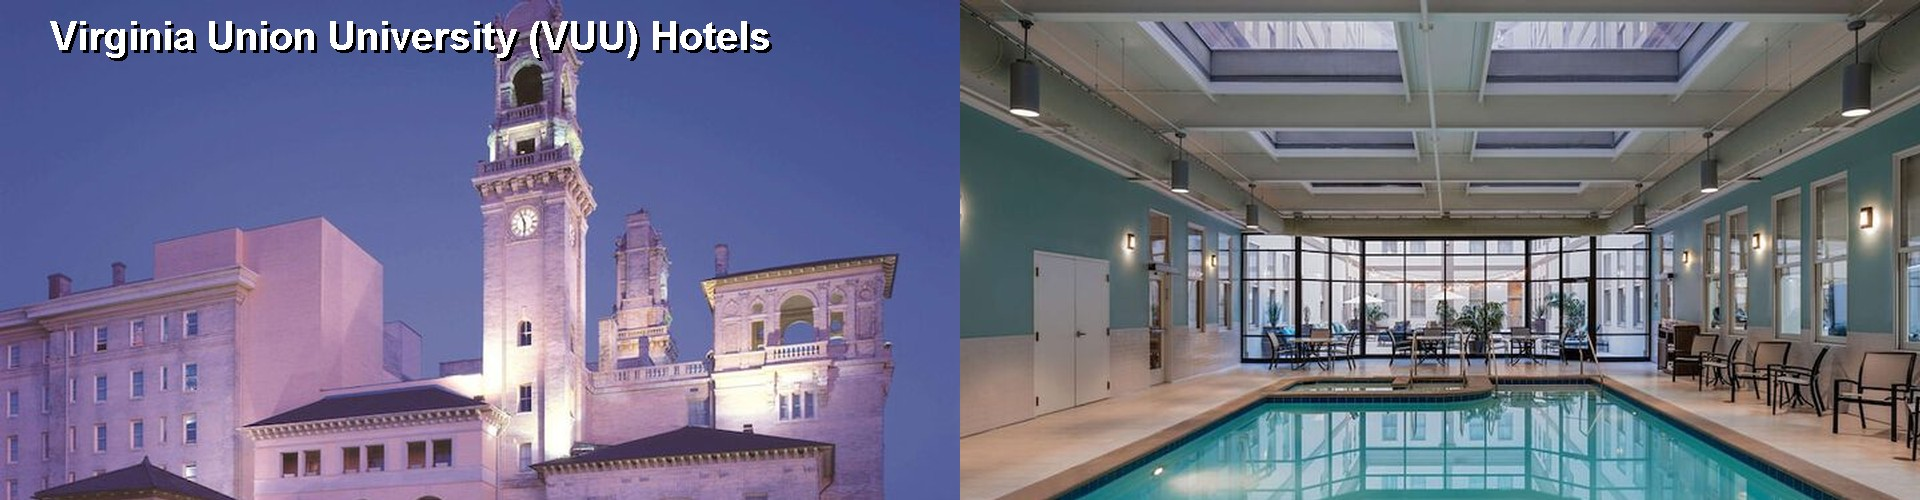 5 Best Hotels Near Virginia Union University Vuu